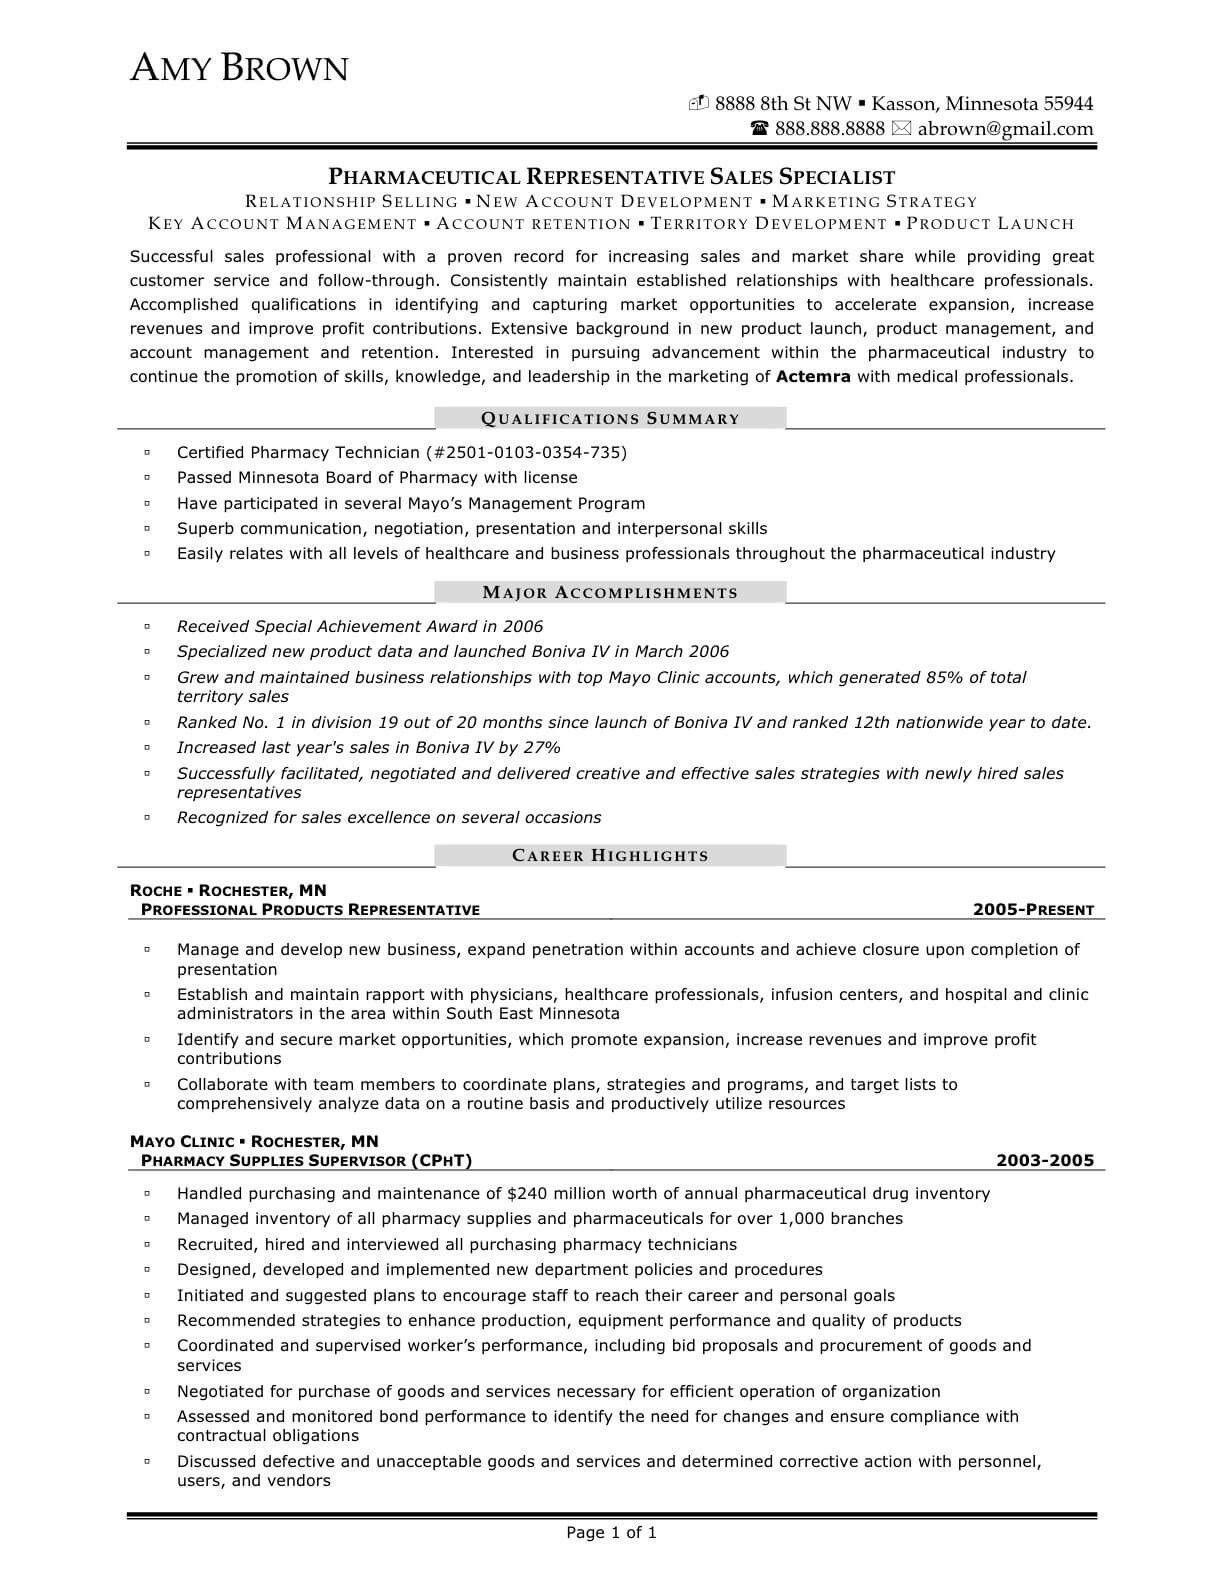 pharmaceutical representative resume samples